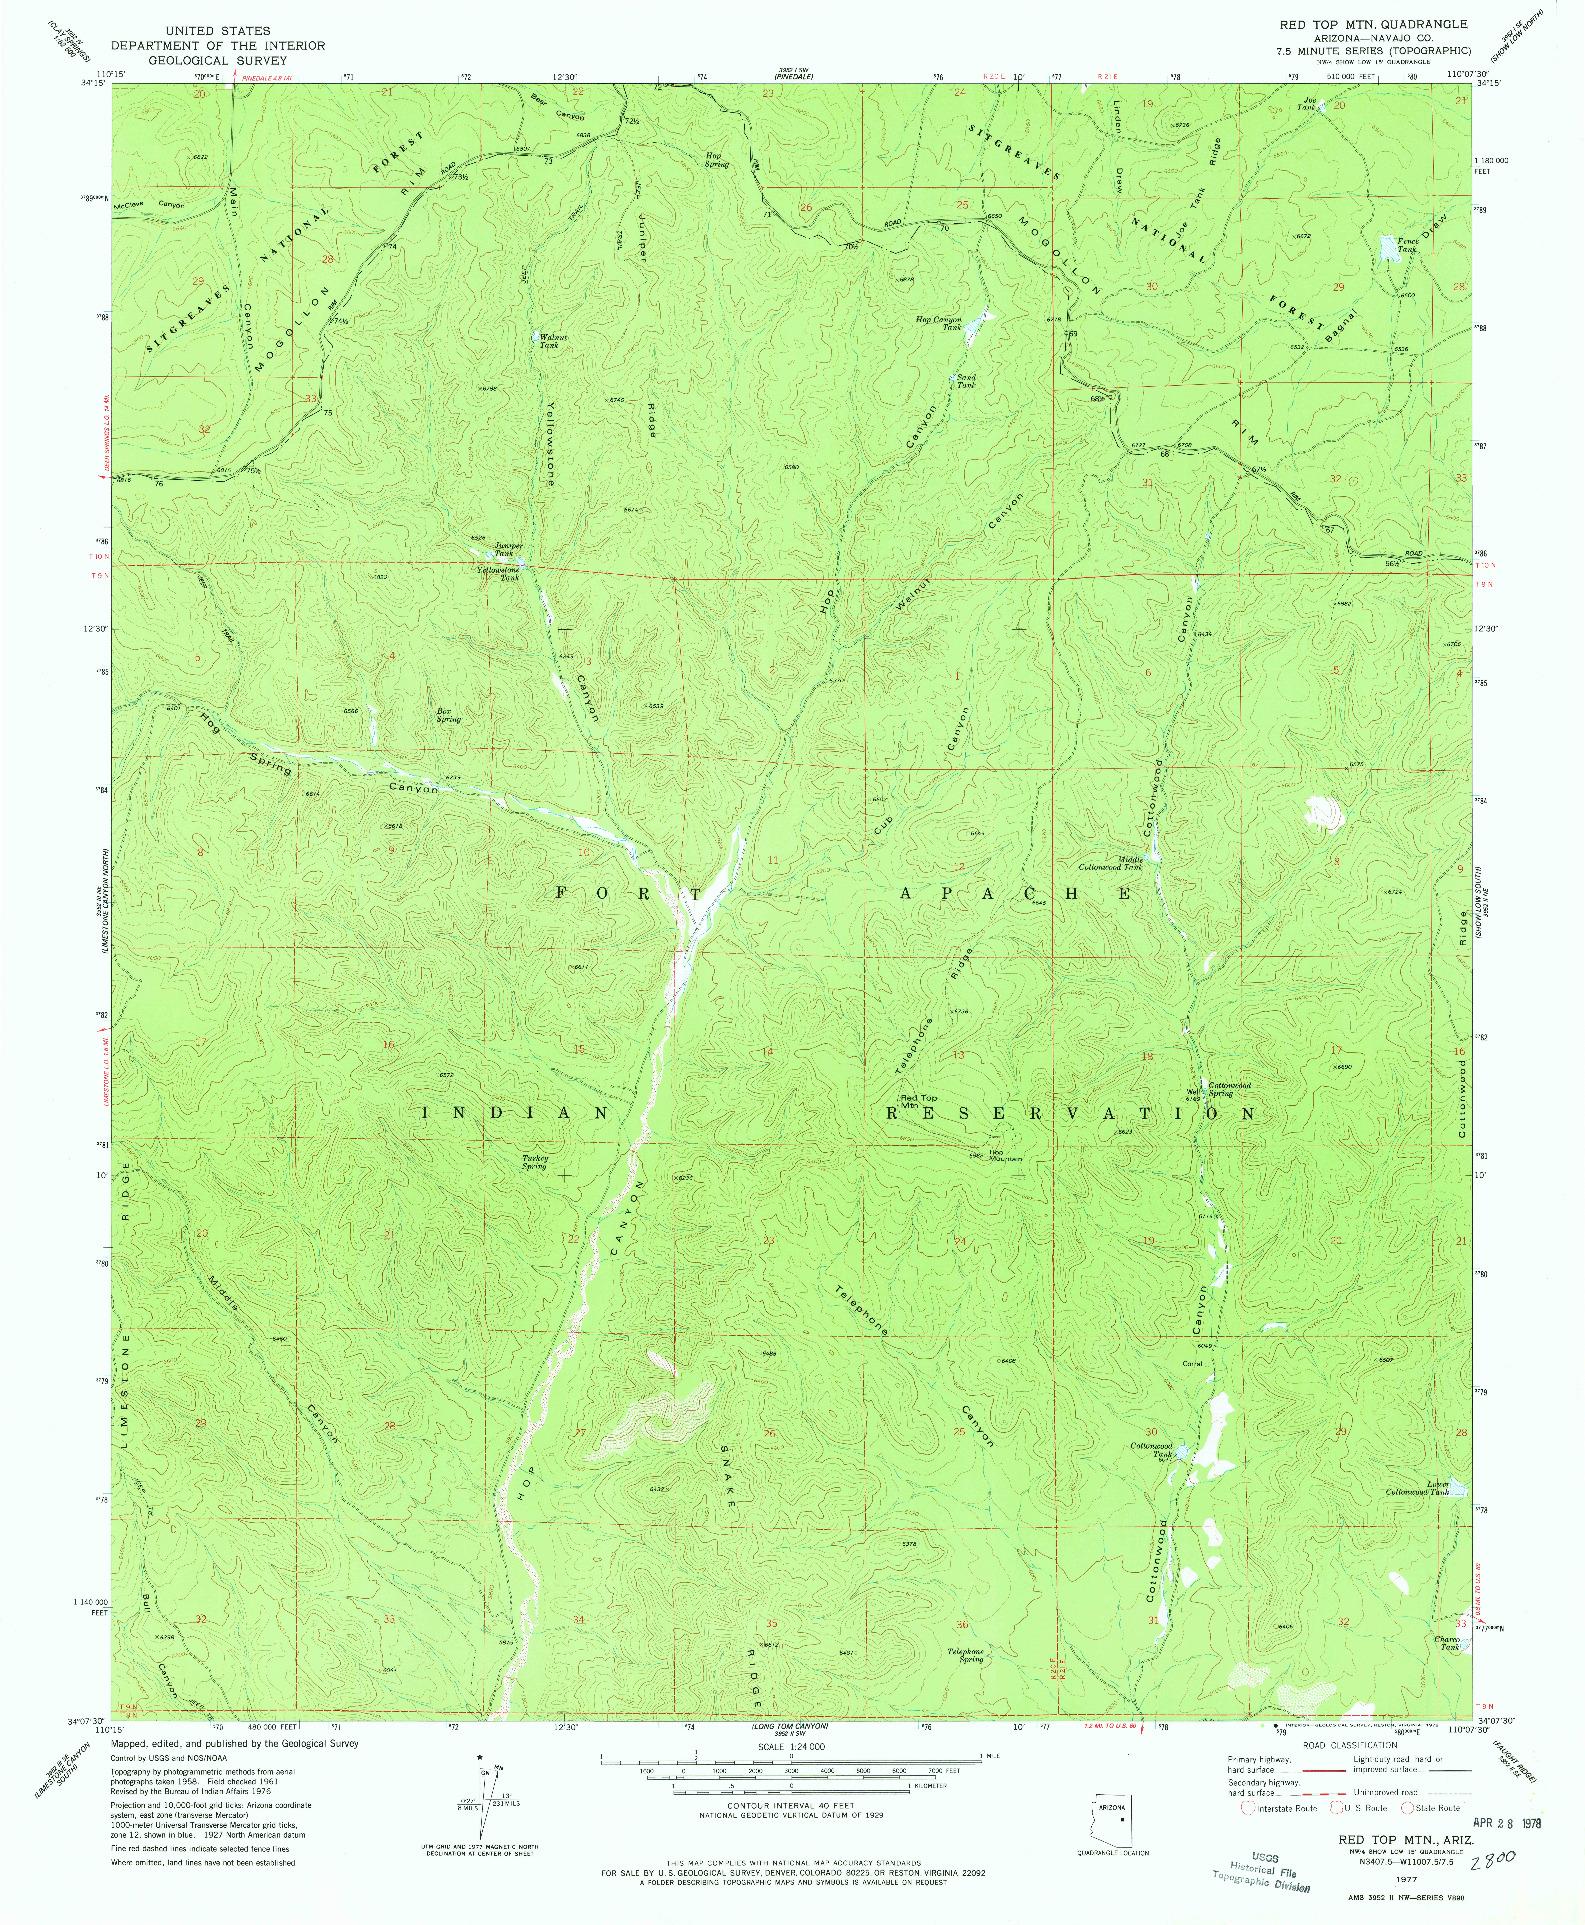 USGS 1:24000-SCALE QUADRANGLE FOR RED TOP MTN., AZ 1977